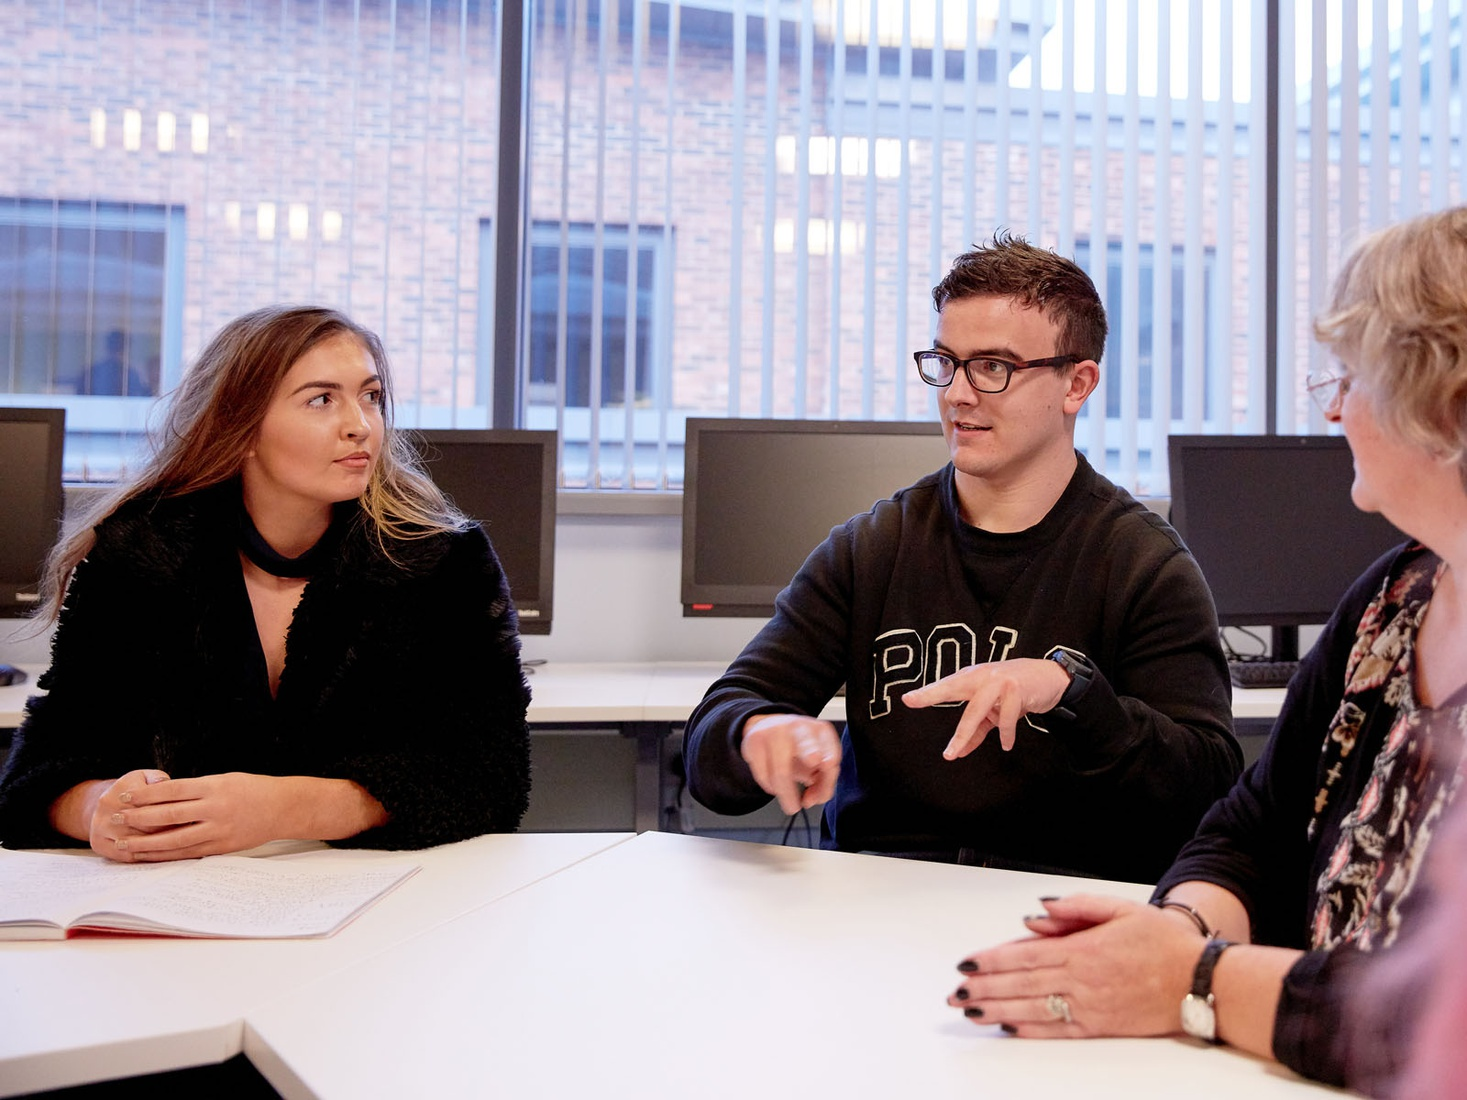 Student using sign language